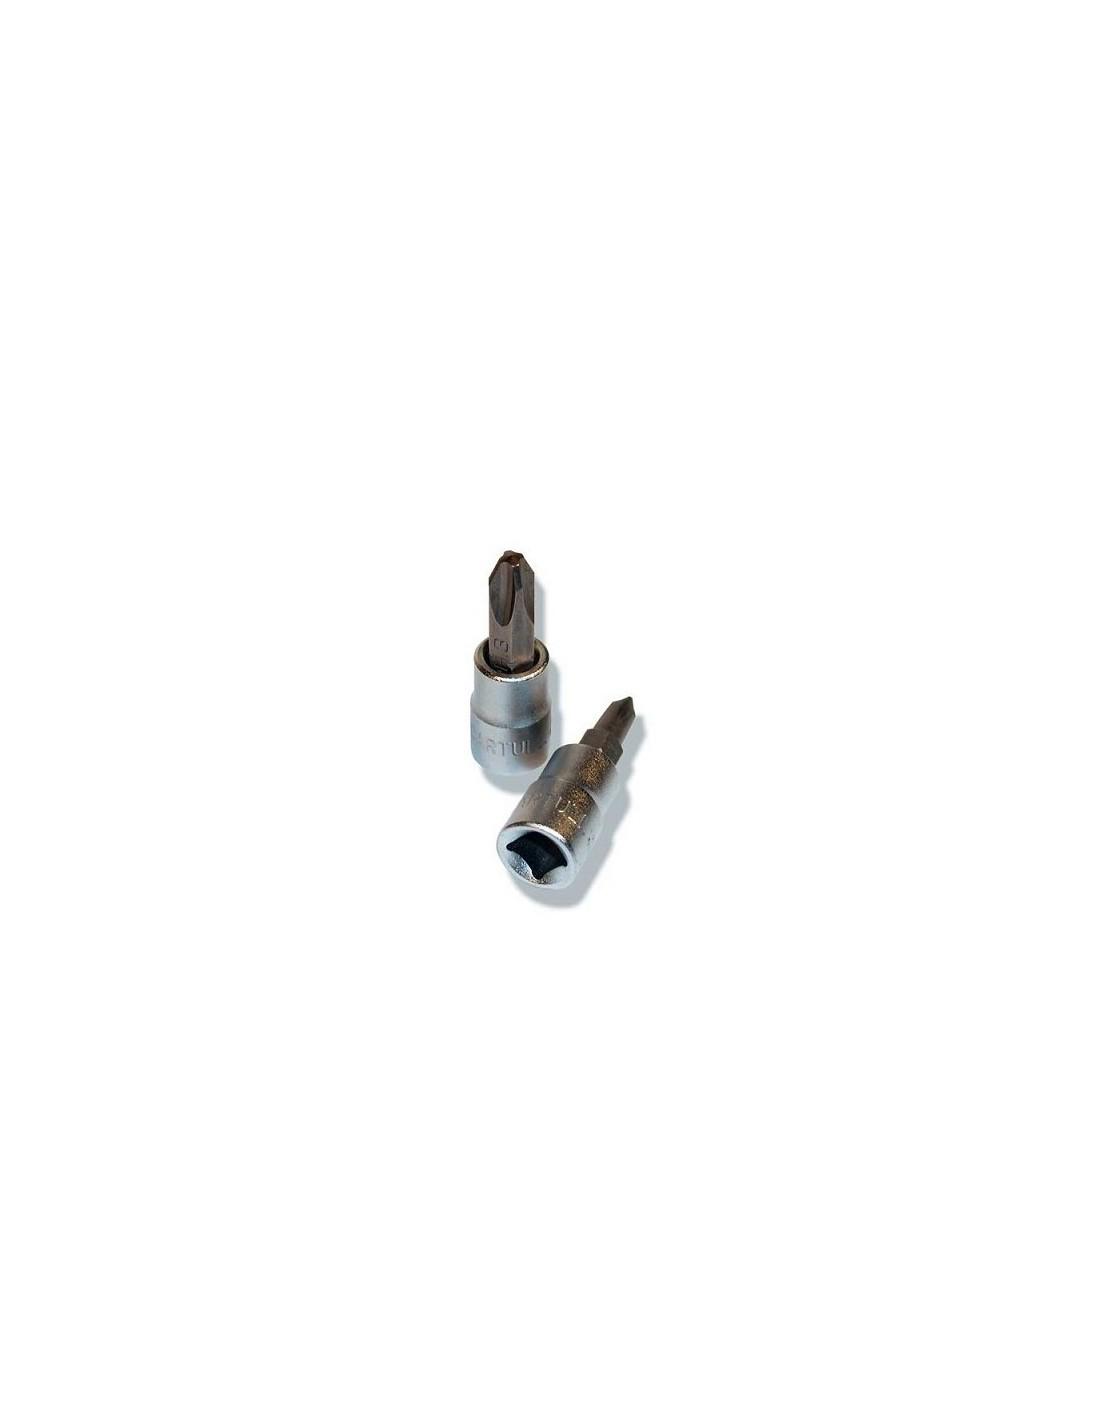 CARRO TALLER PARA HERRAMIENTAS 5 CAJONES - Jomafa 07b4be2390a3